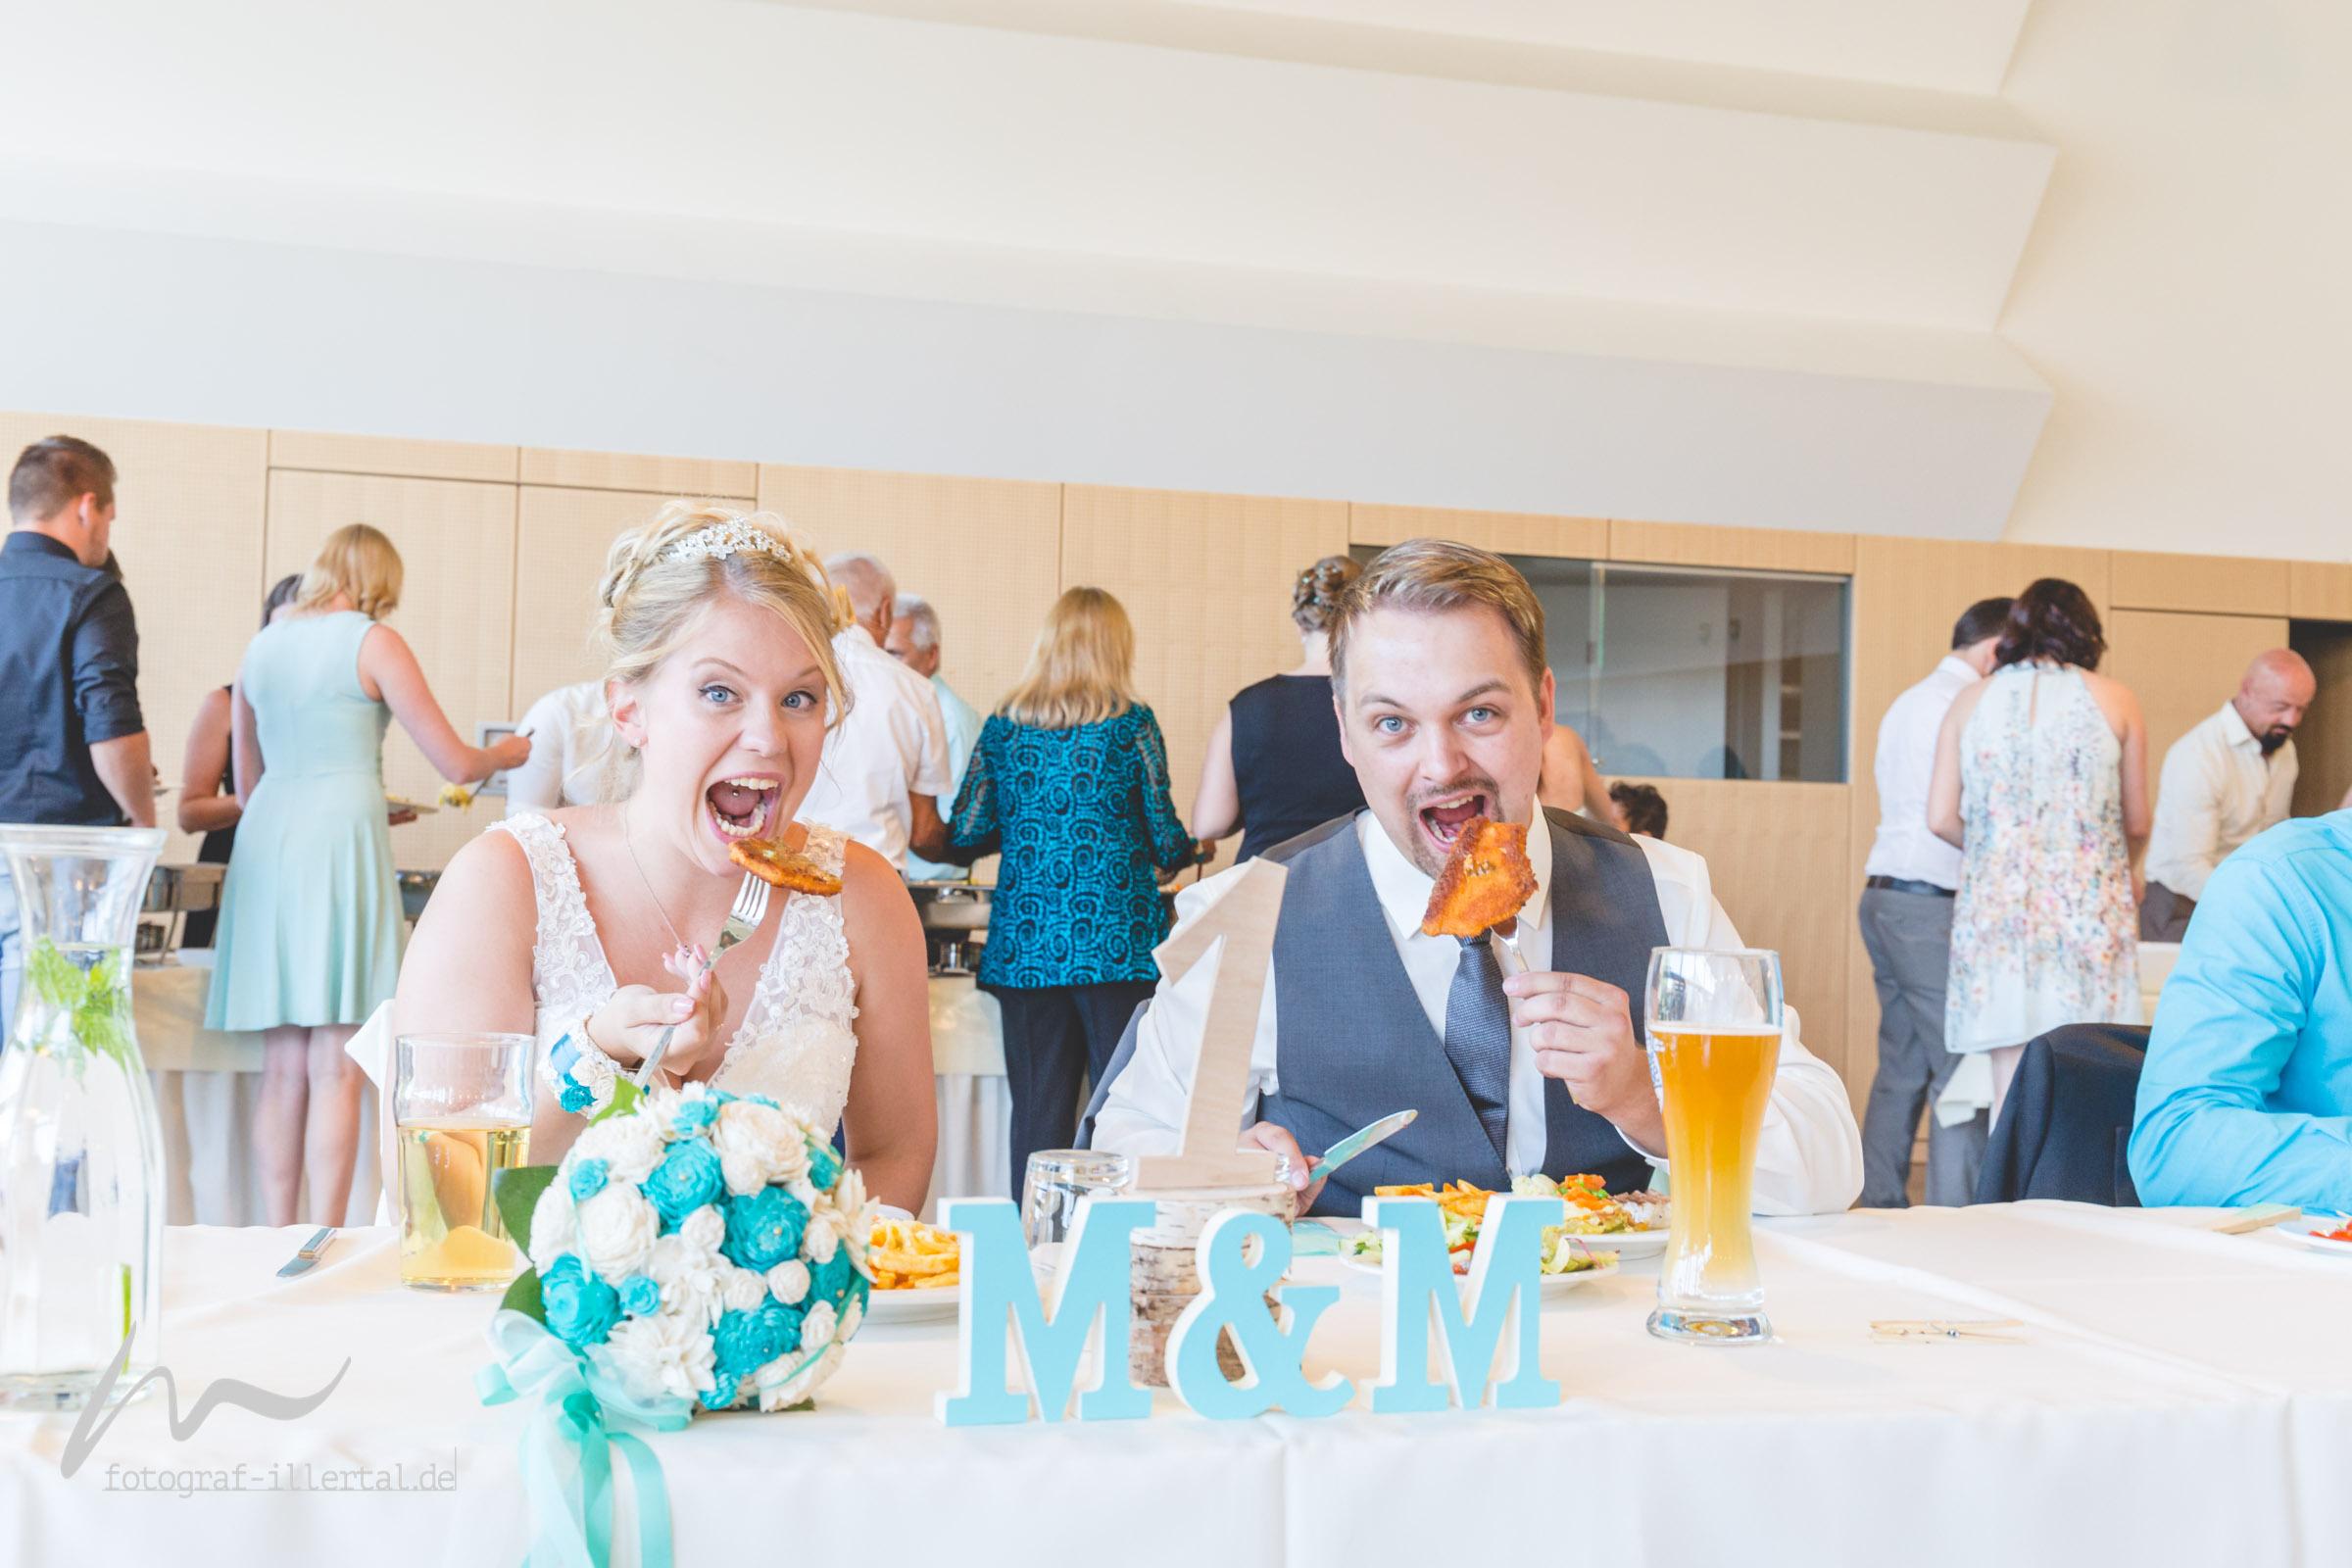 Fotograf Illertal-Christian Miller-Hochzeitsfotografie-_MG_6611